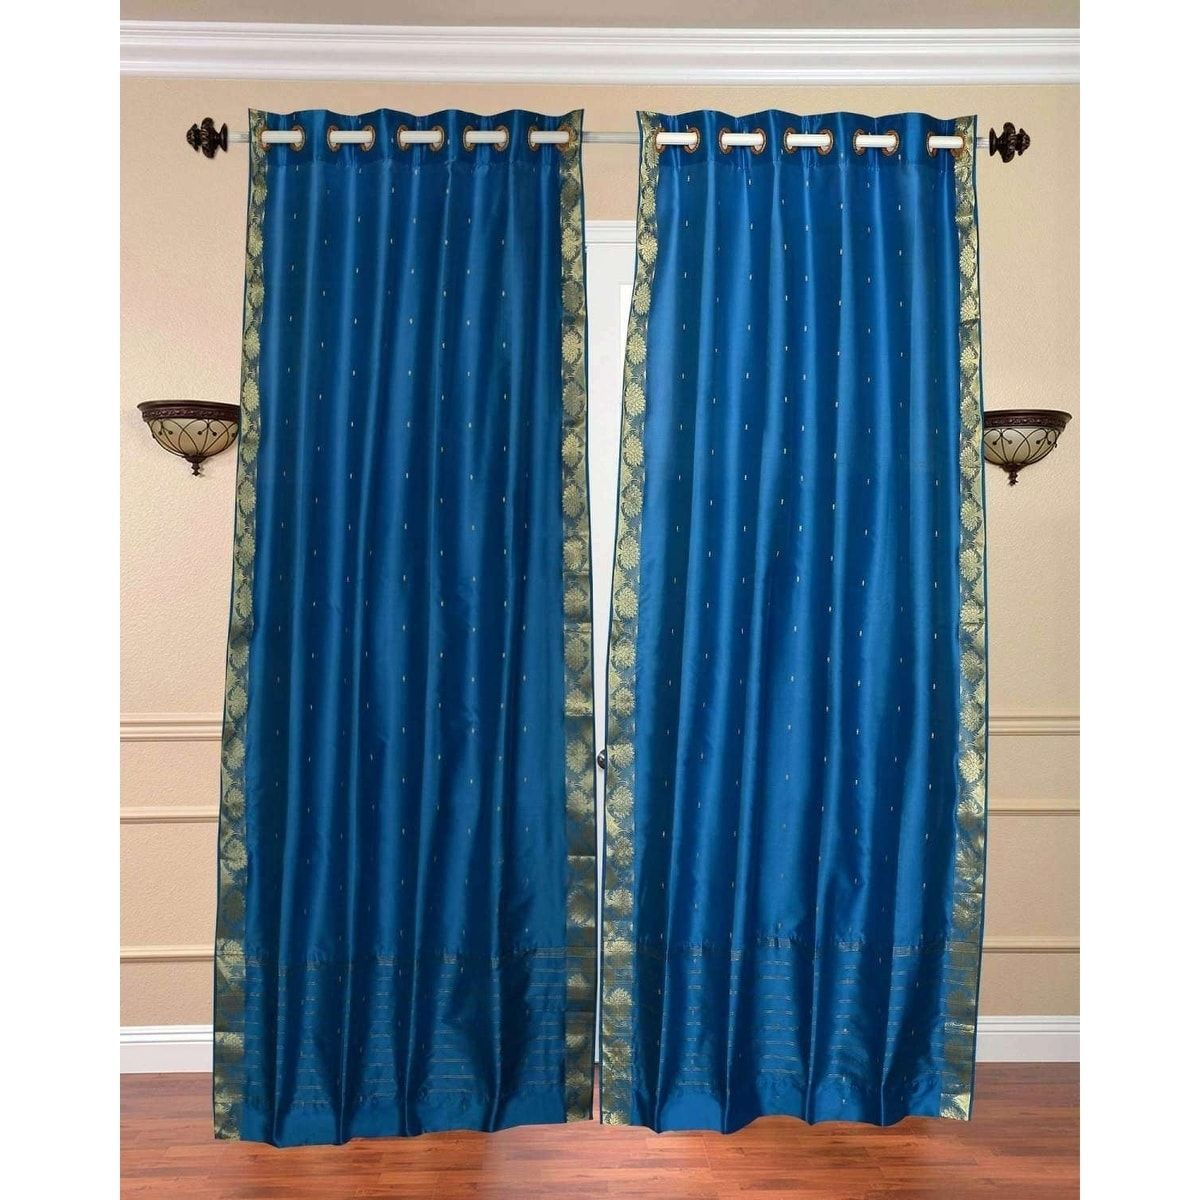 Indian Selections Turquoise Ring Top Sheer Sari Curtain Drape